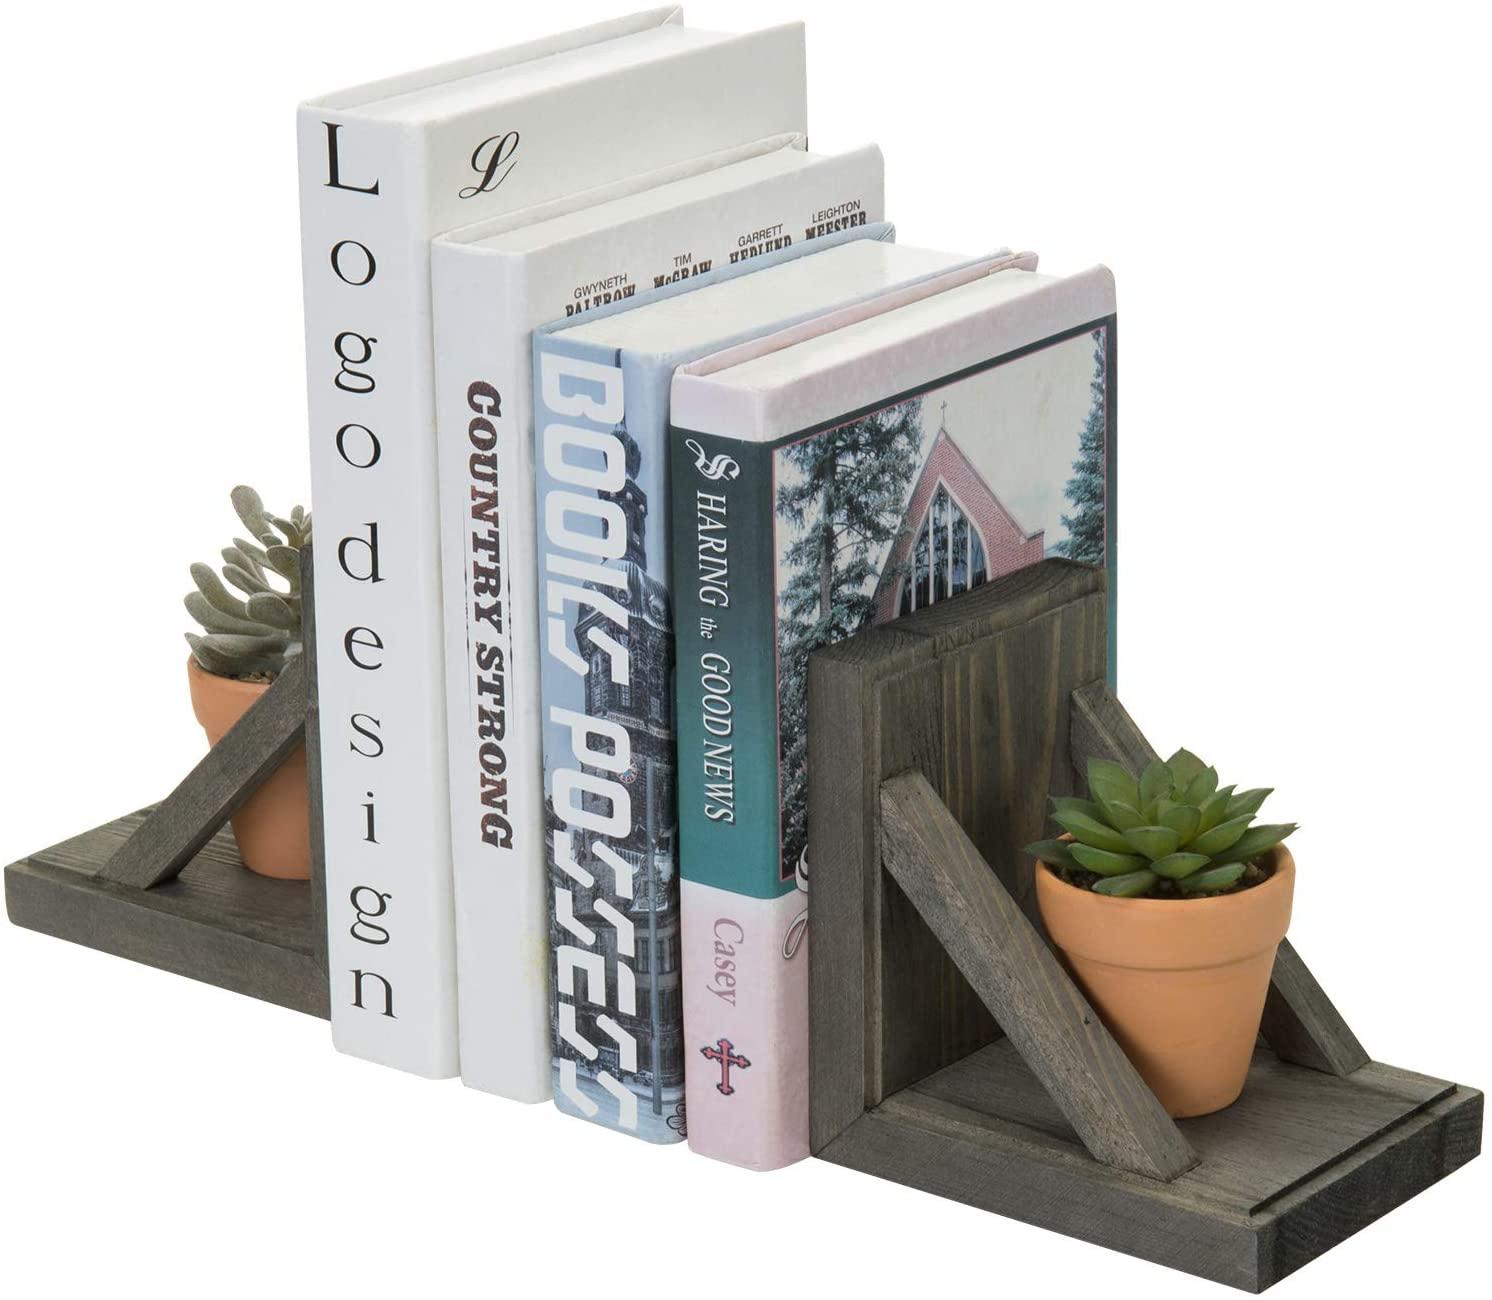 MyGift 2 Piece Set Vintage Gray Wood and Brass Metal Decorative Desktop Bookends